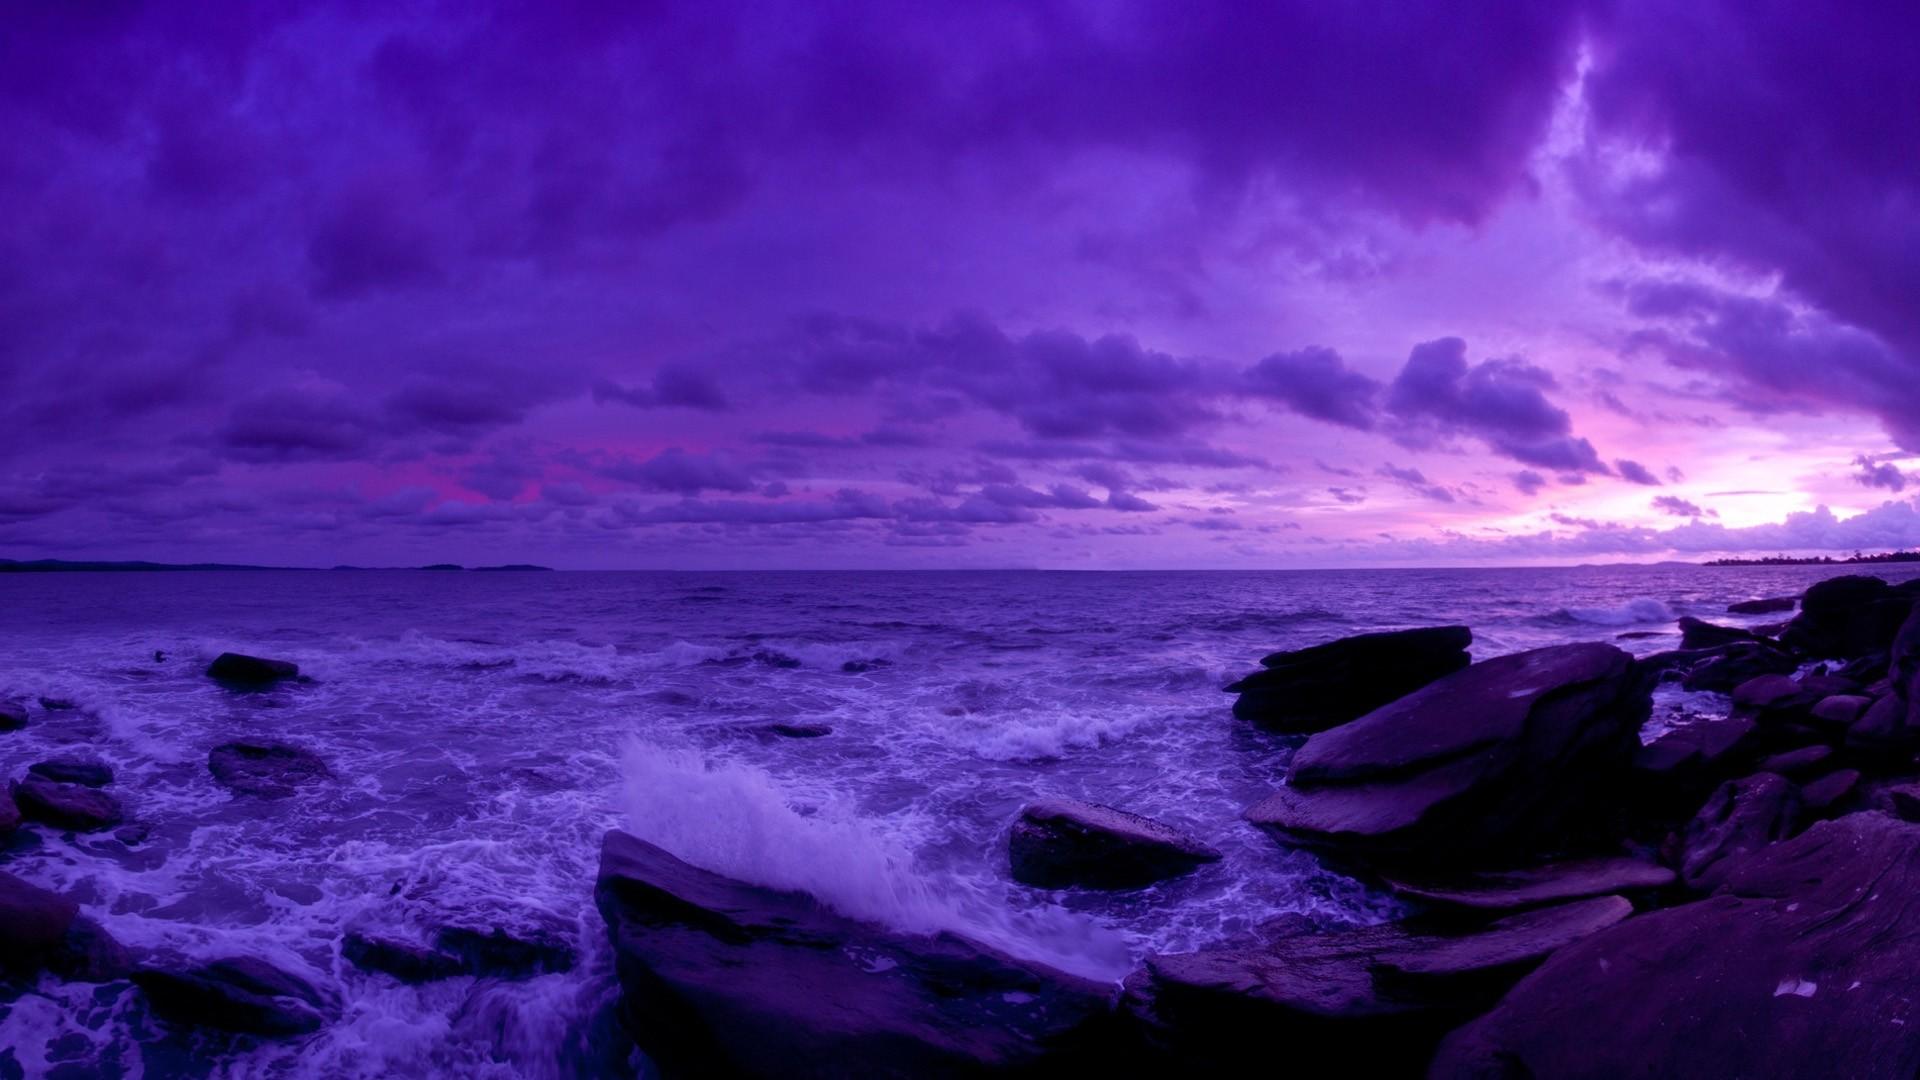 Purple Sky Wallpaper for pc